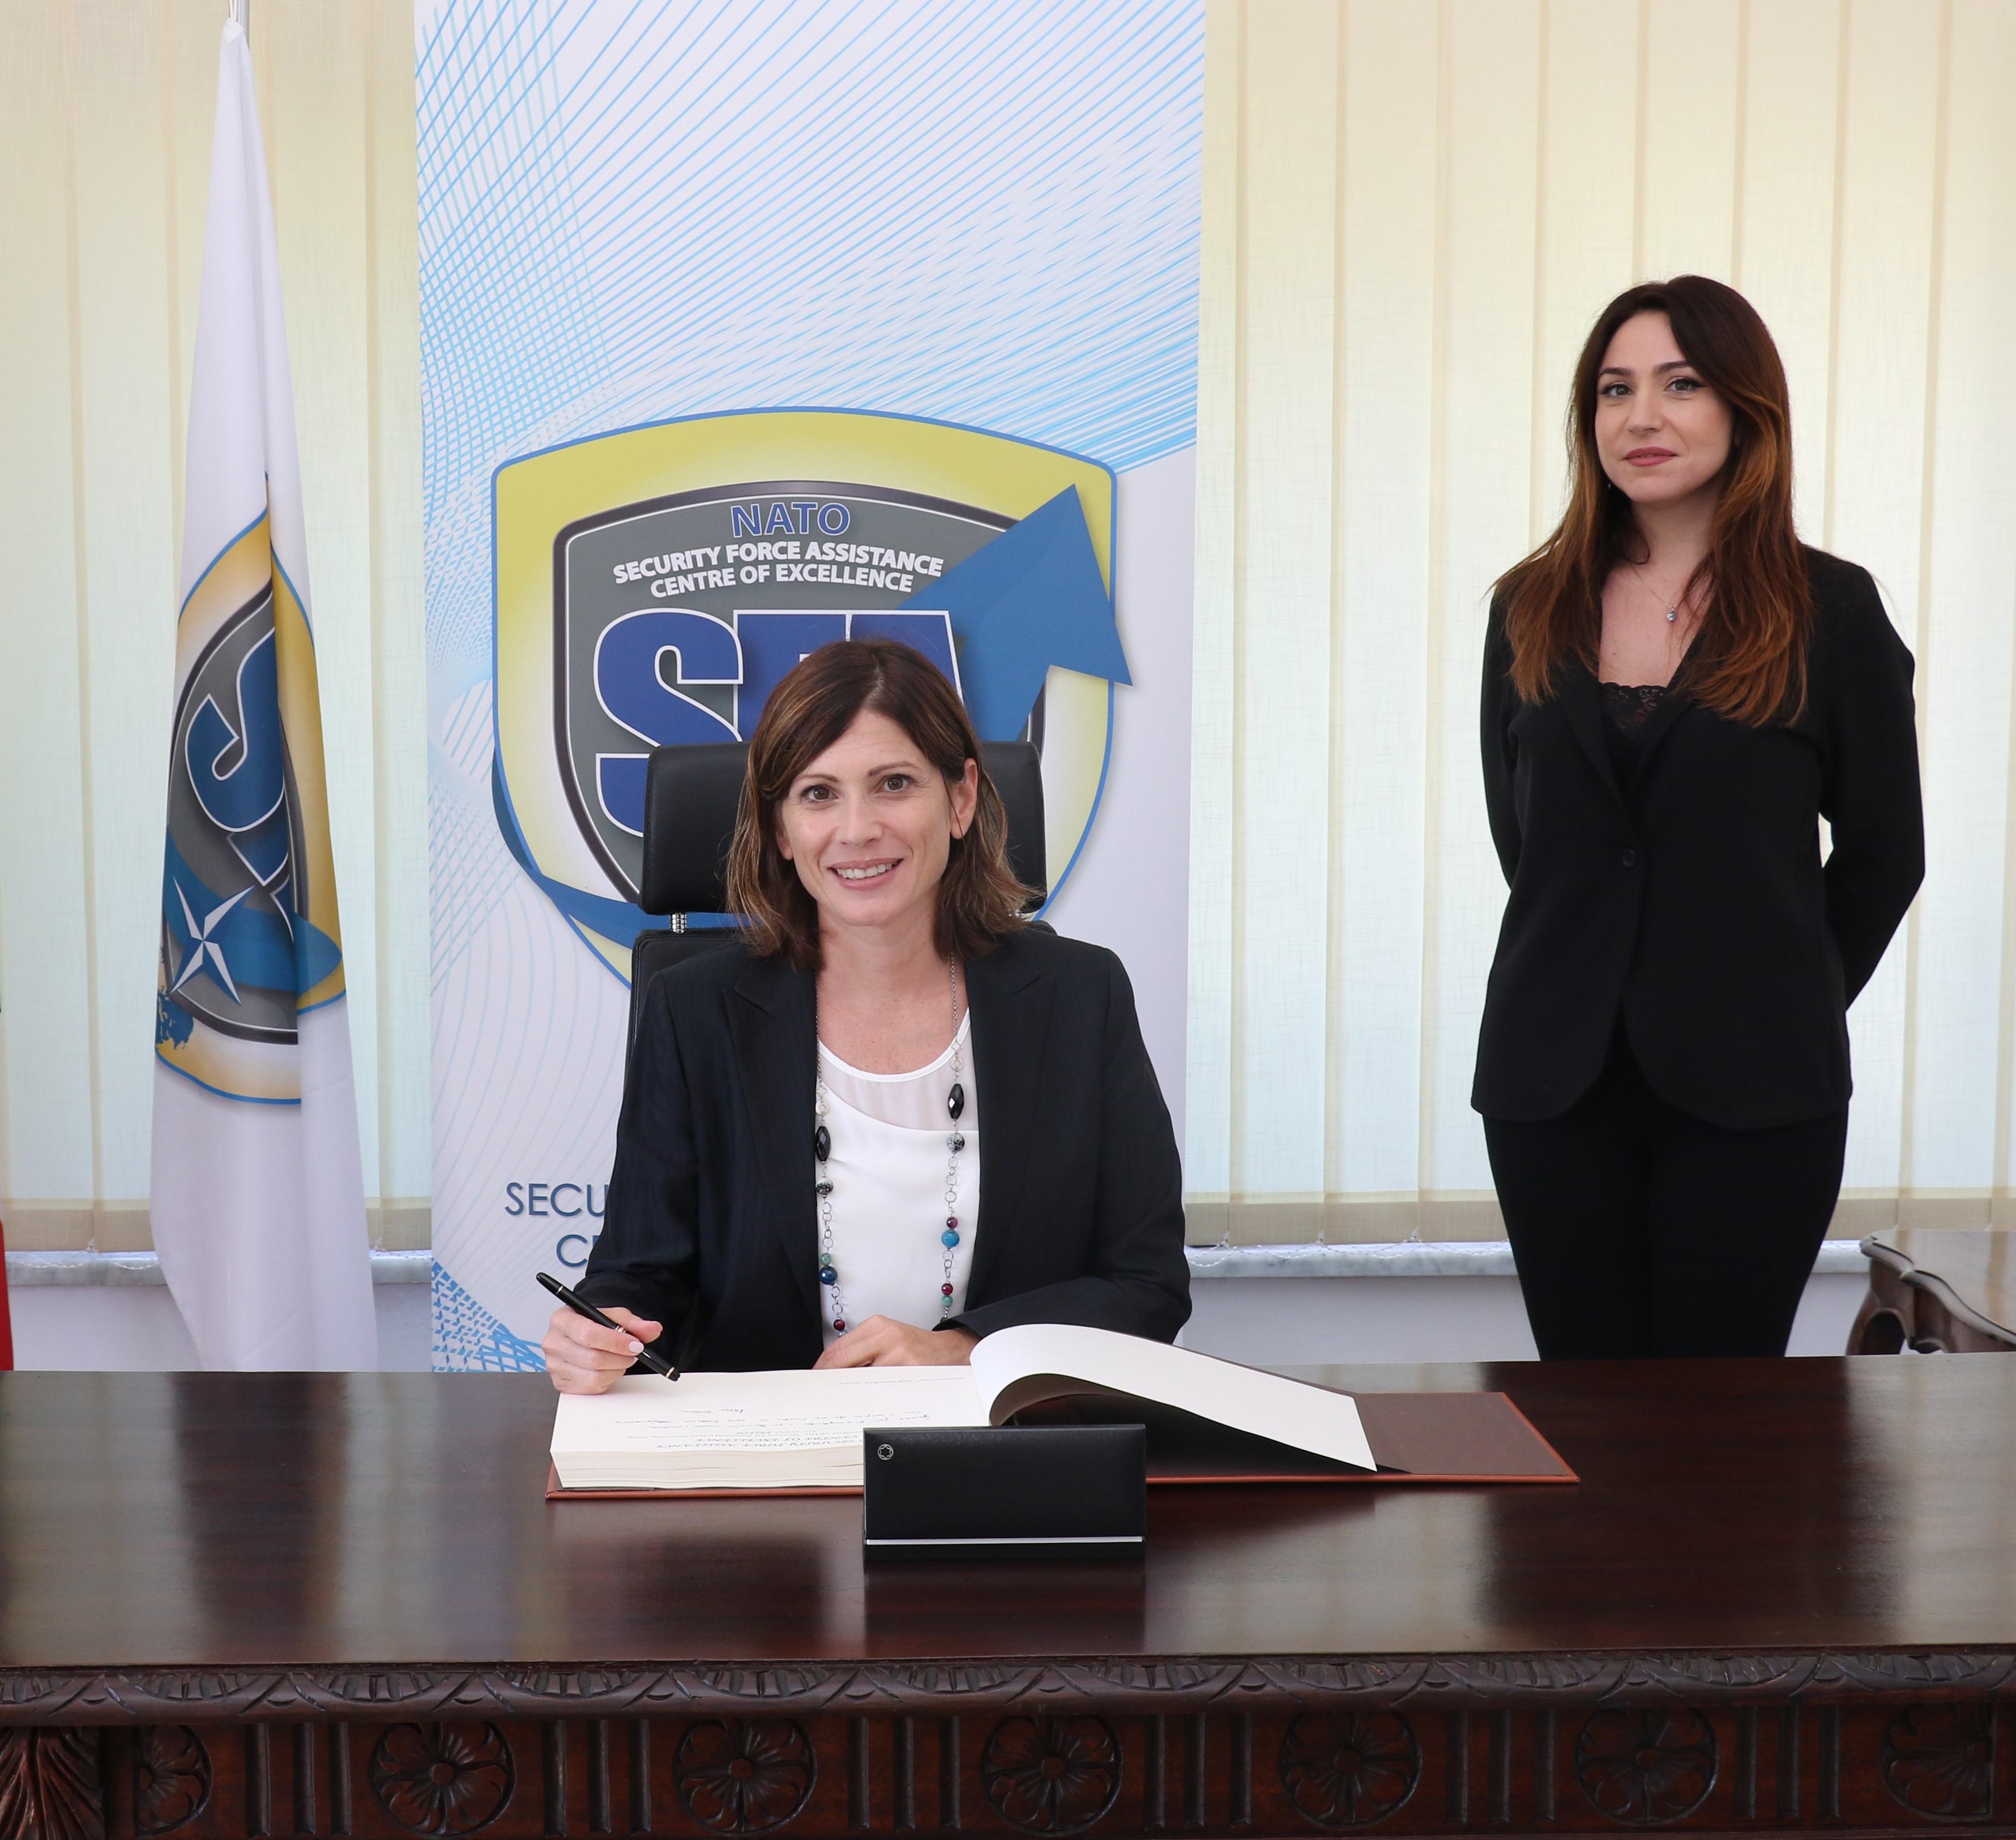 Interview with Mrs Irene FELLIN – President of Women In International Security (WIIS) Italy